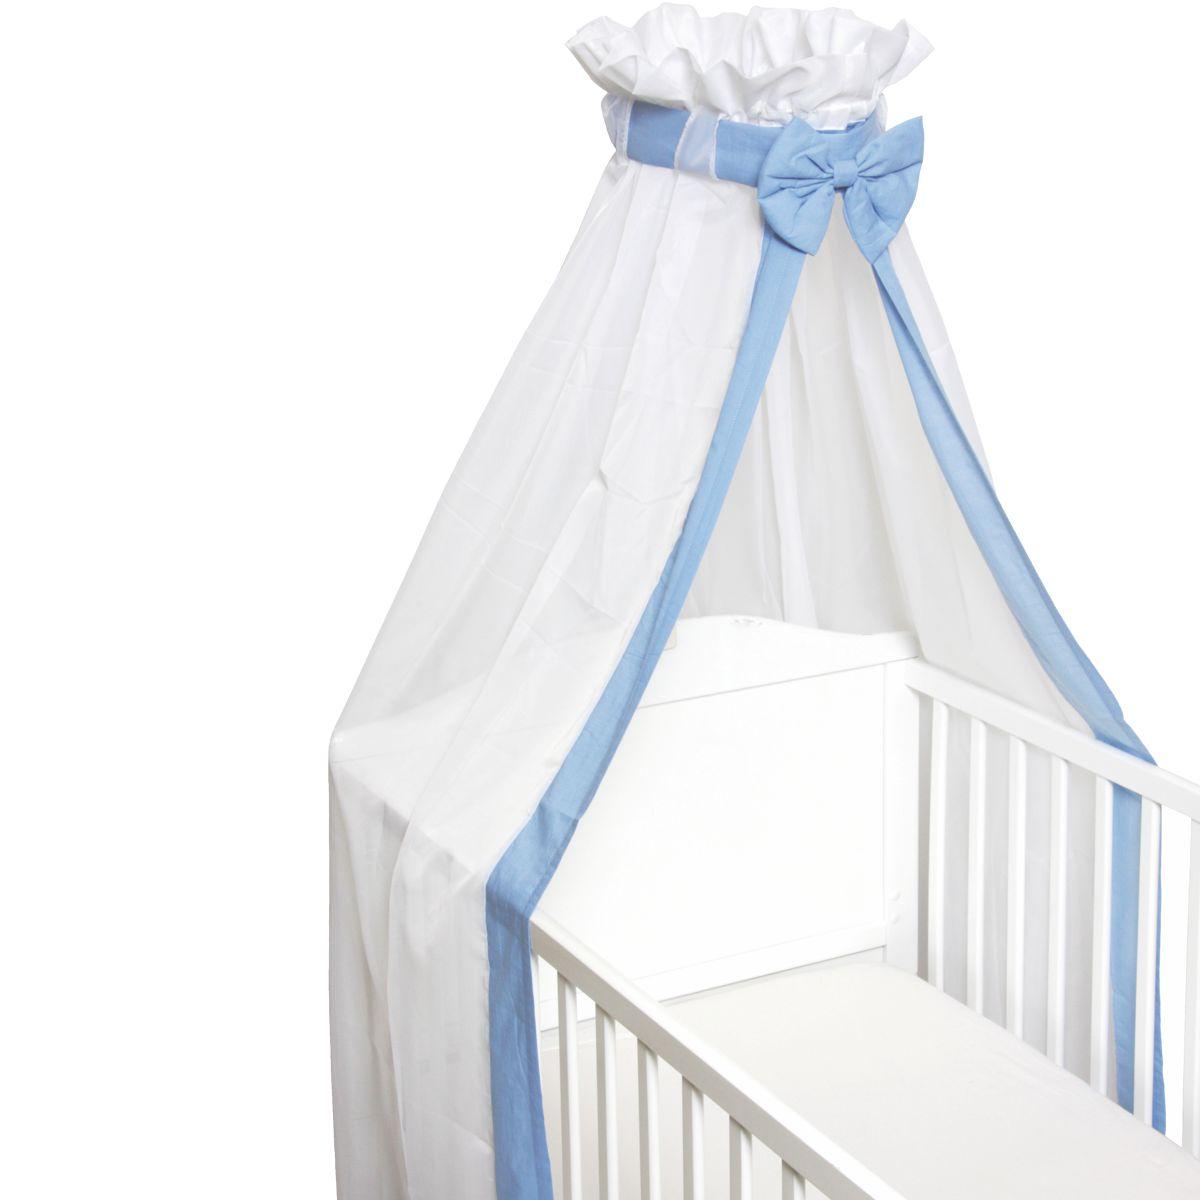 babybett schleier betthimmel moskitonetz baldachin baby bett dach himmel ebay. Black Bedroom Furniture Sets. Home Design Ideas